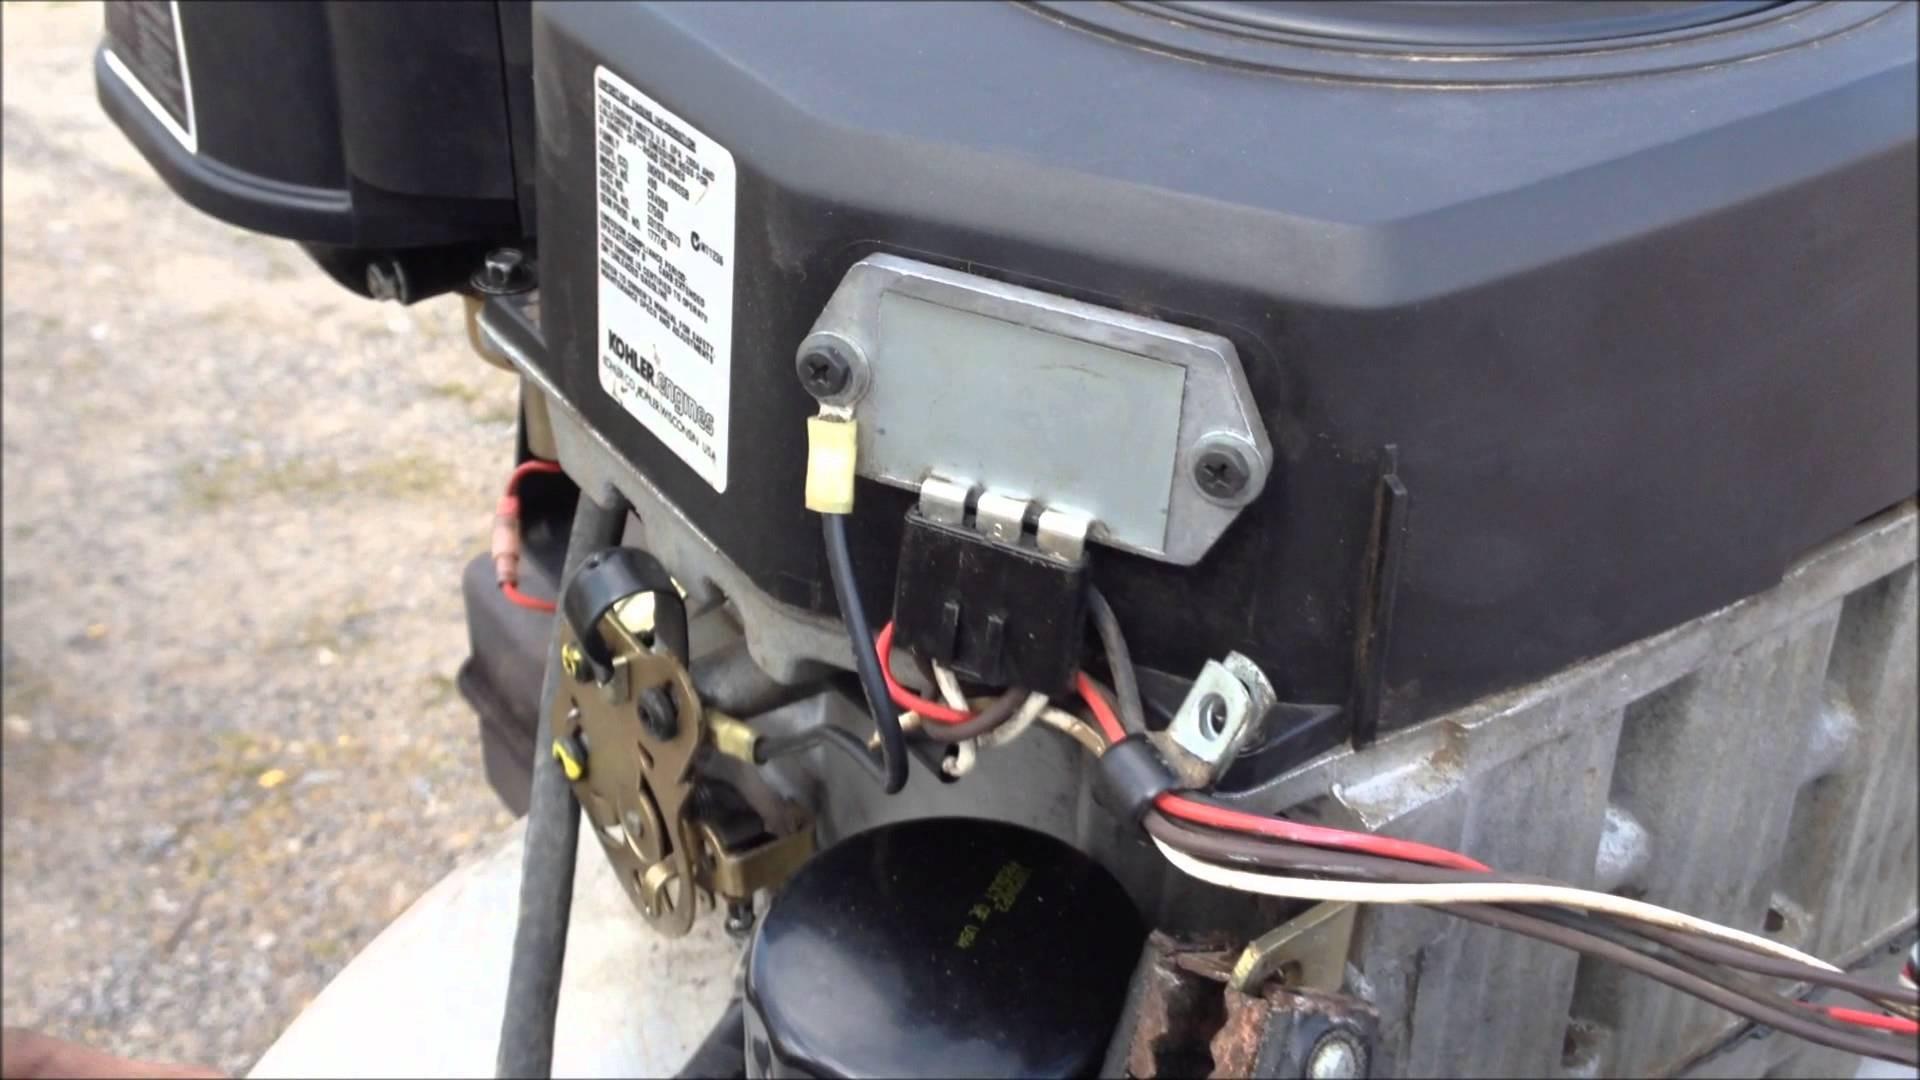 Kohler Engine Charging System Diagram Kohler 17hp Of Kohler Engine Charging System Diagram